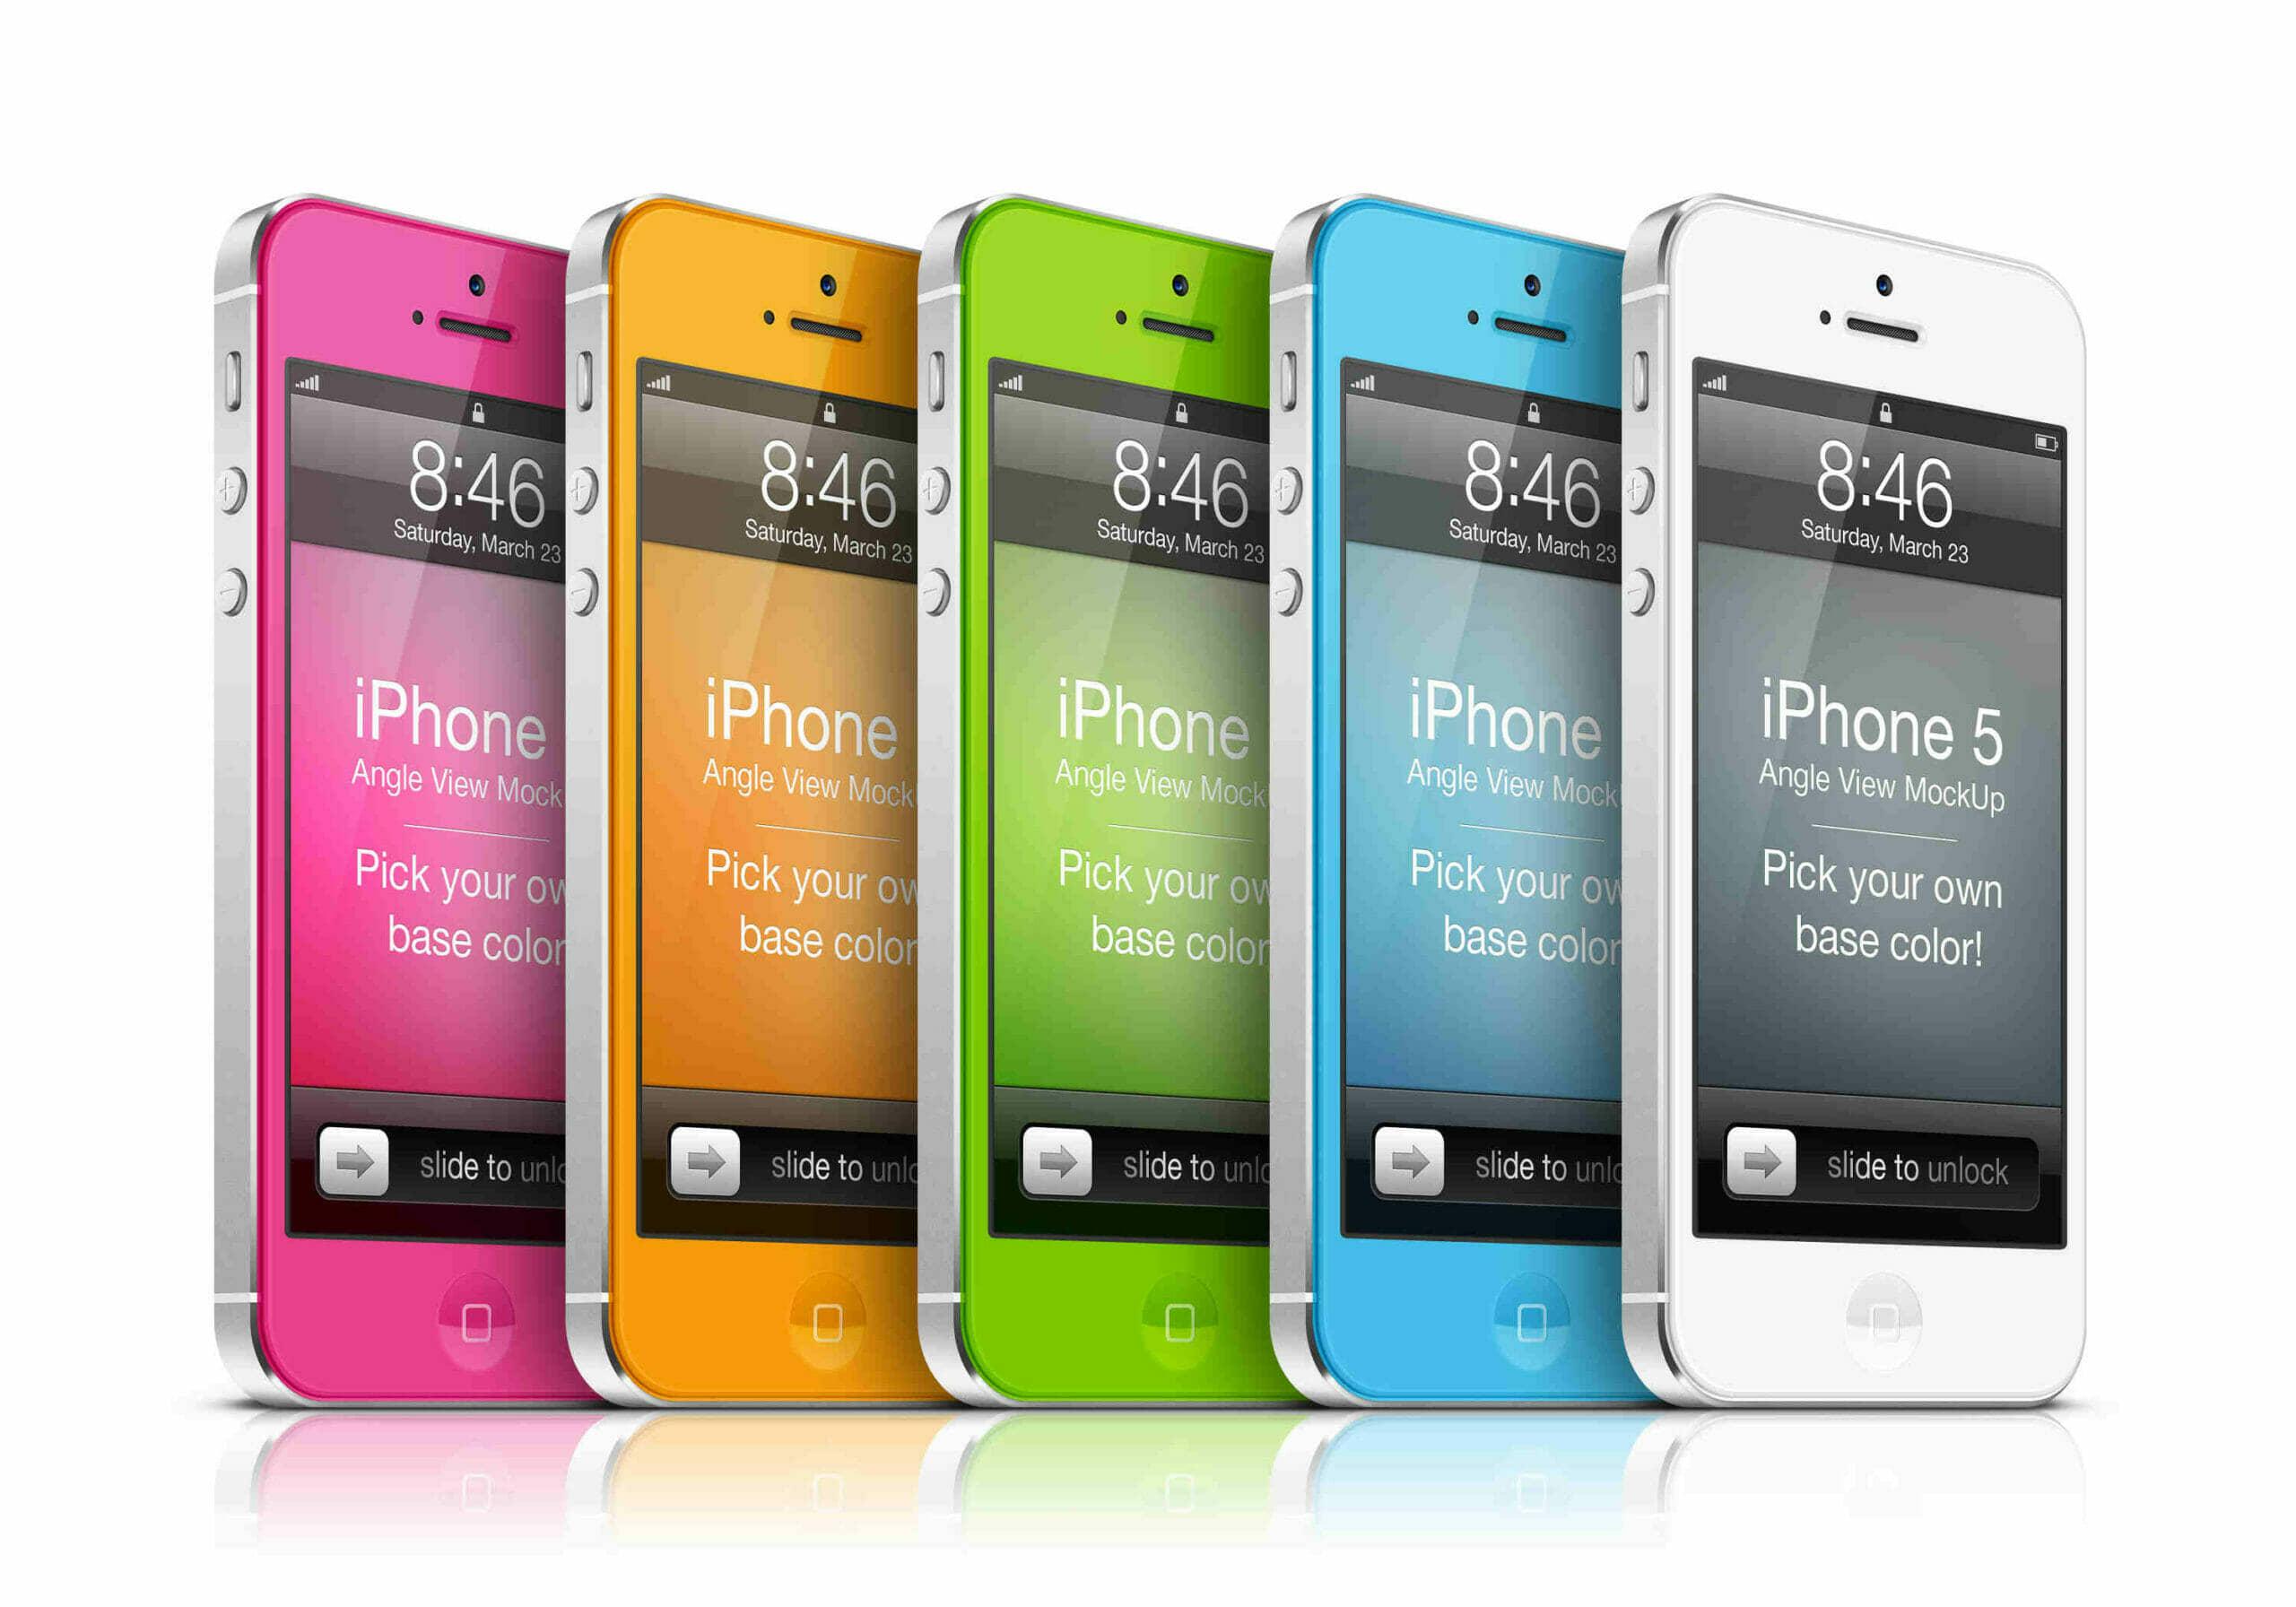 Colorful iPhone 5 Angle View Mockup